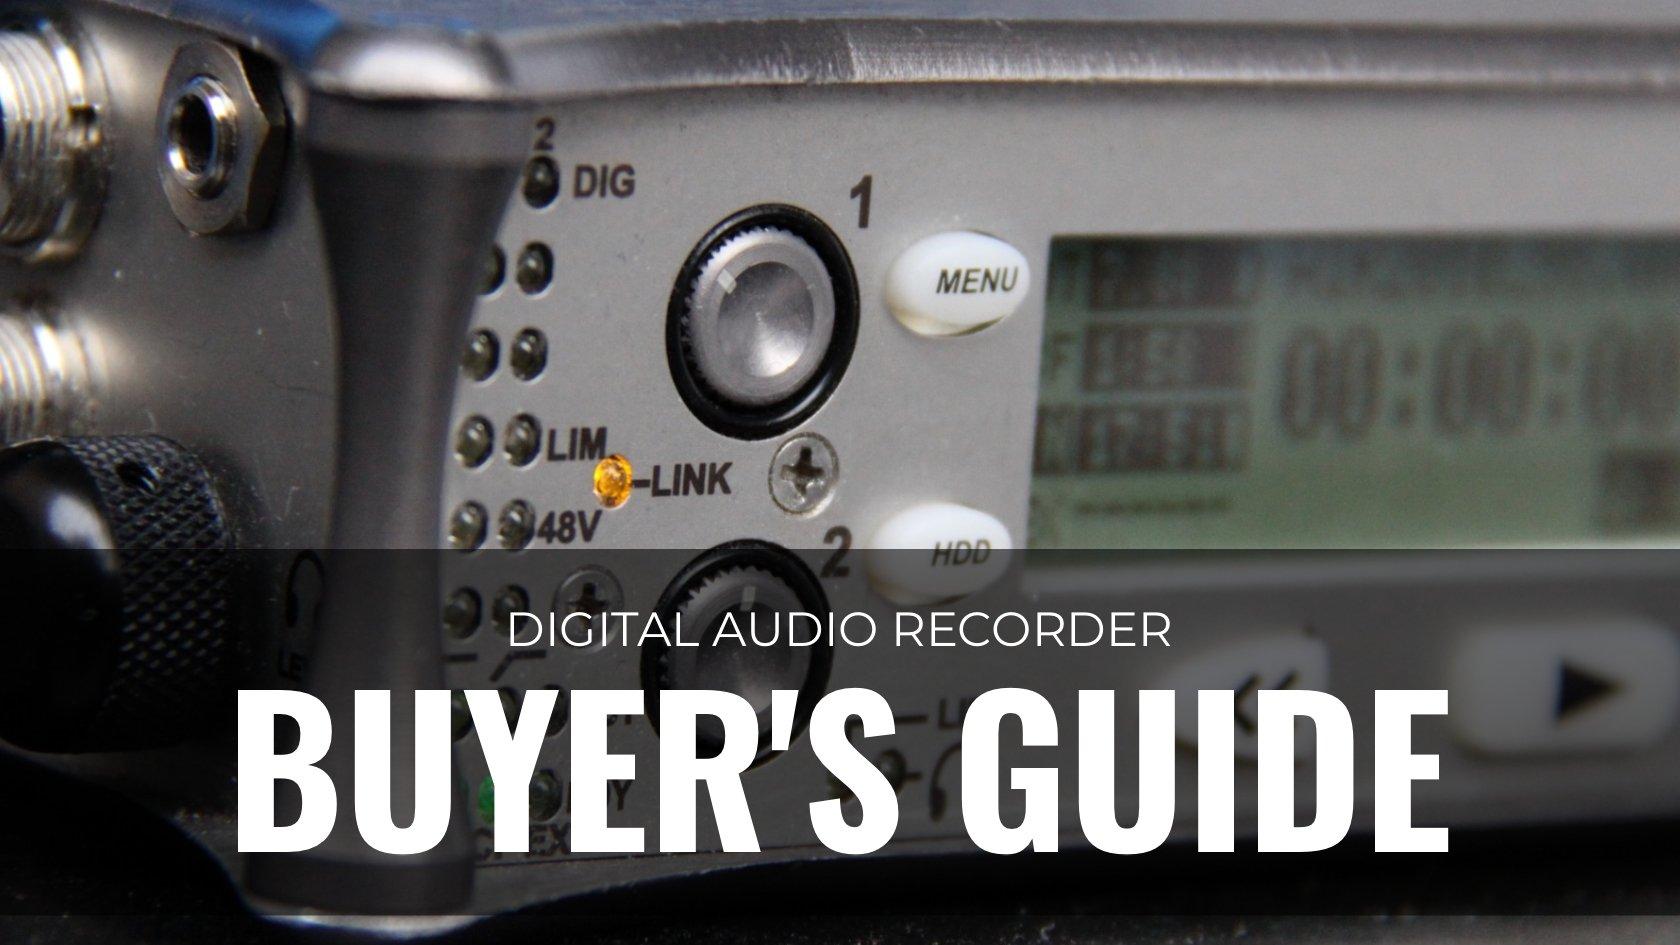 Digital Audio Recorder Buyer's Guide